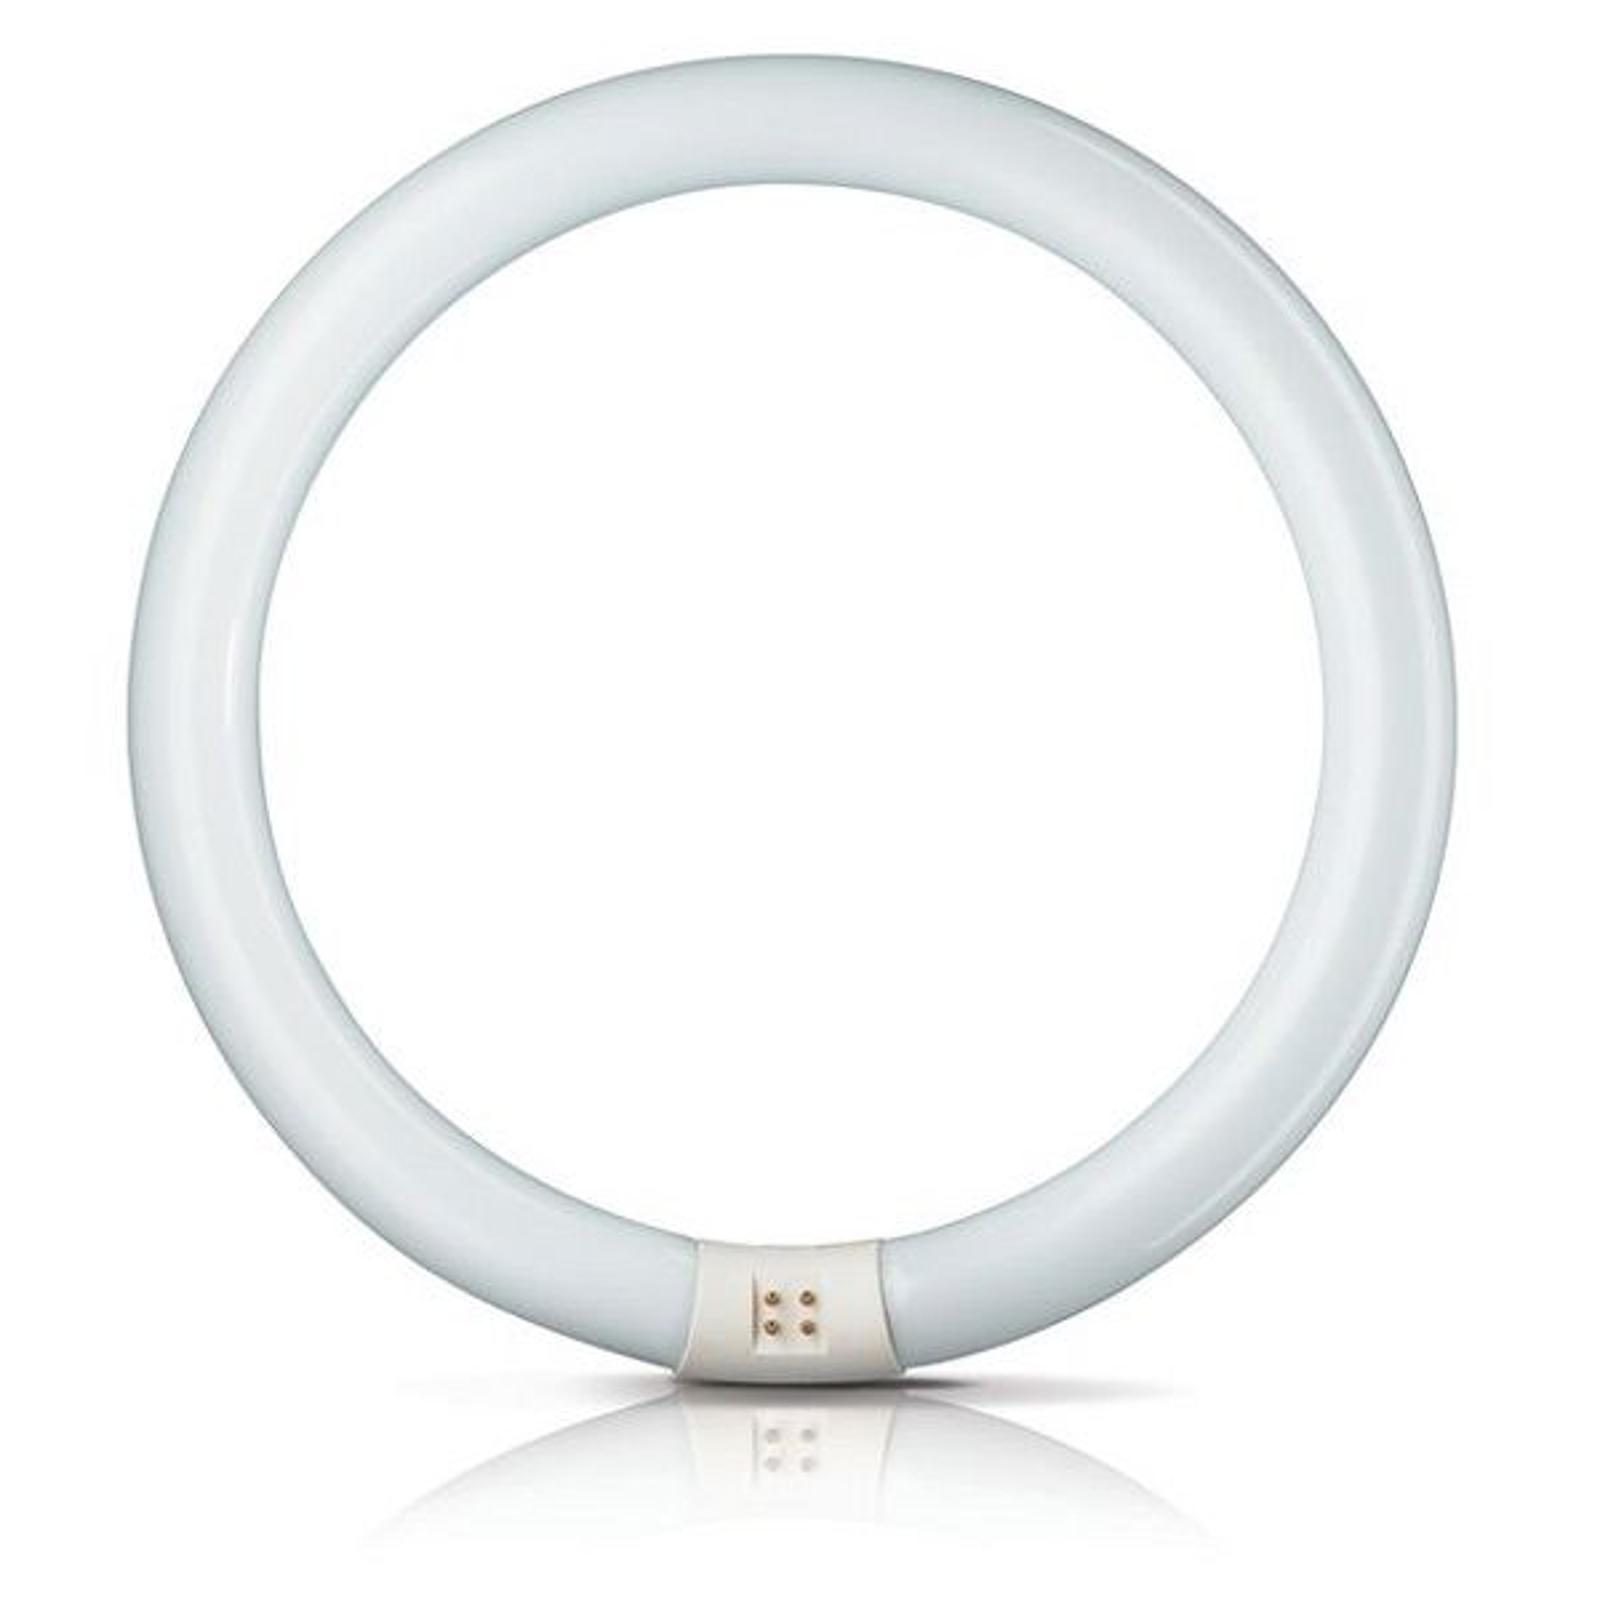 G10q 32W 840 Leuchtstoffring Master Circular TL-E